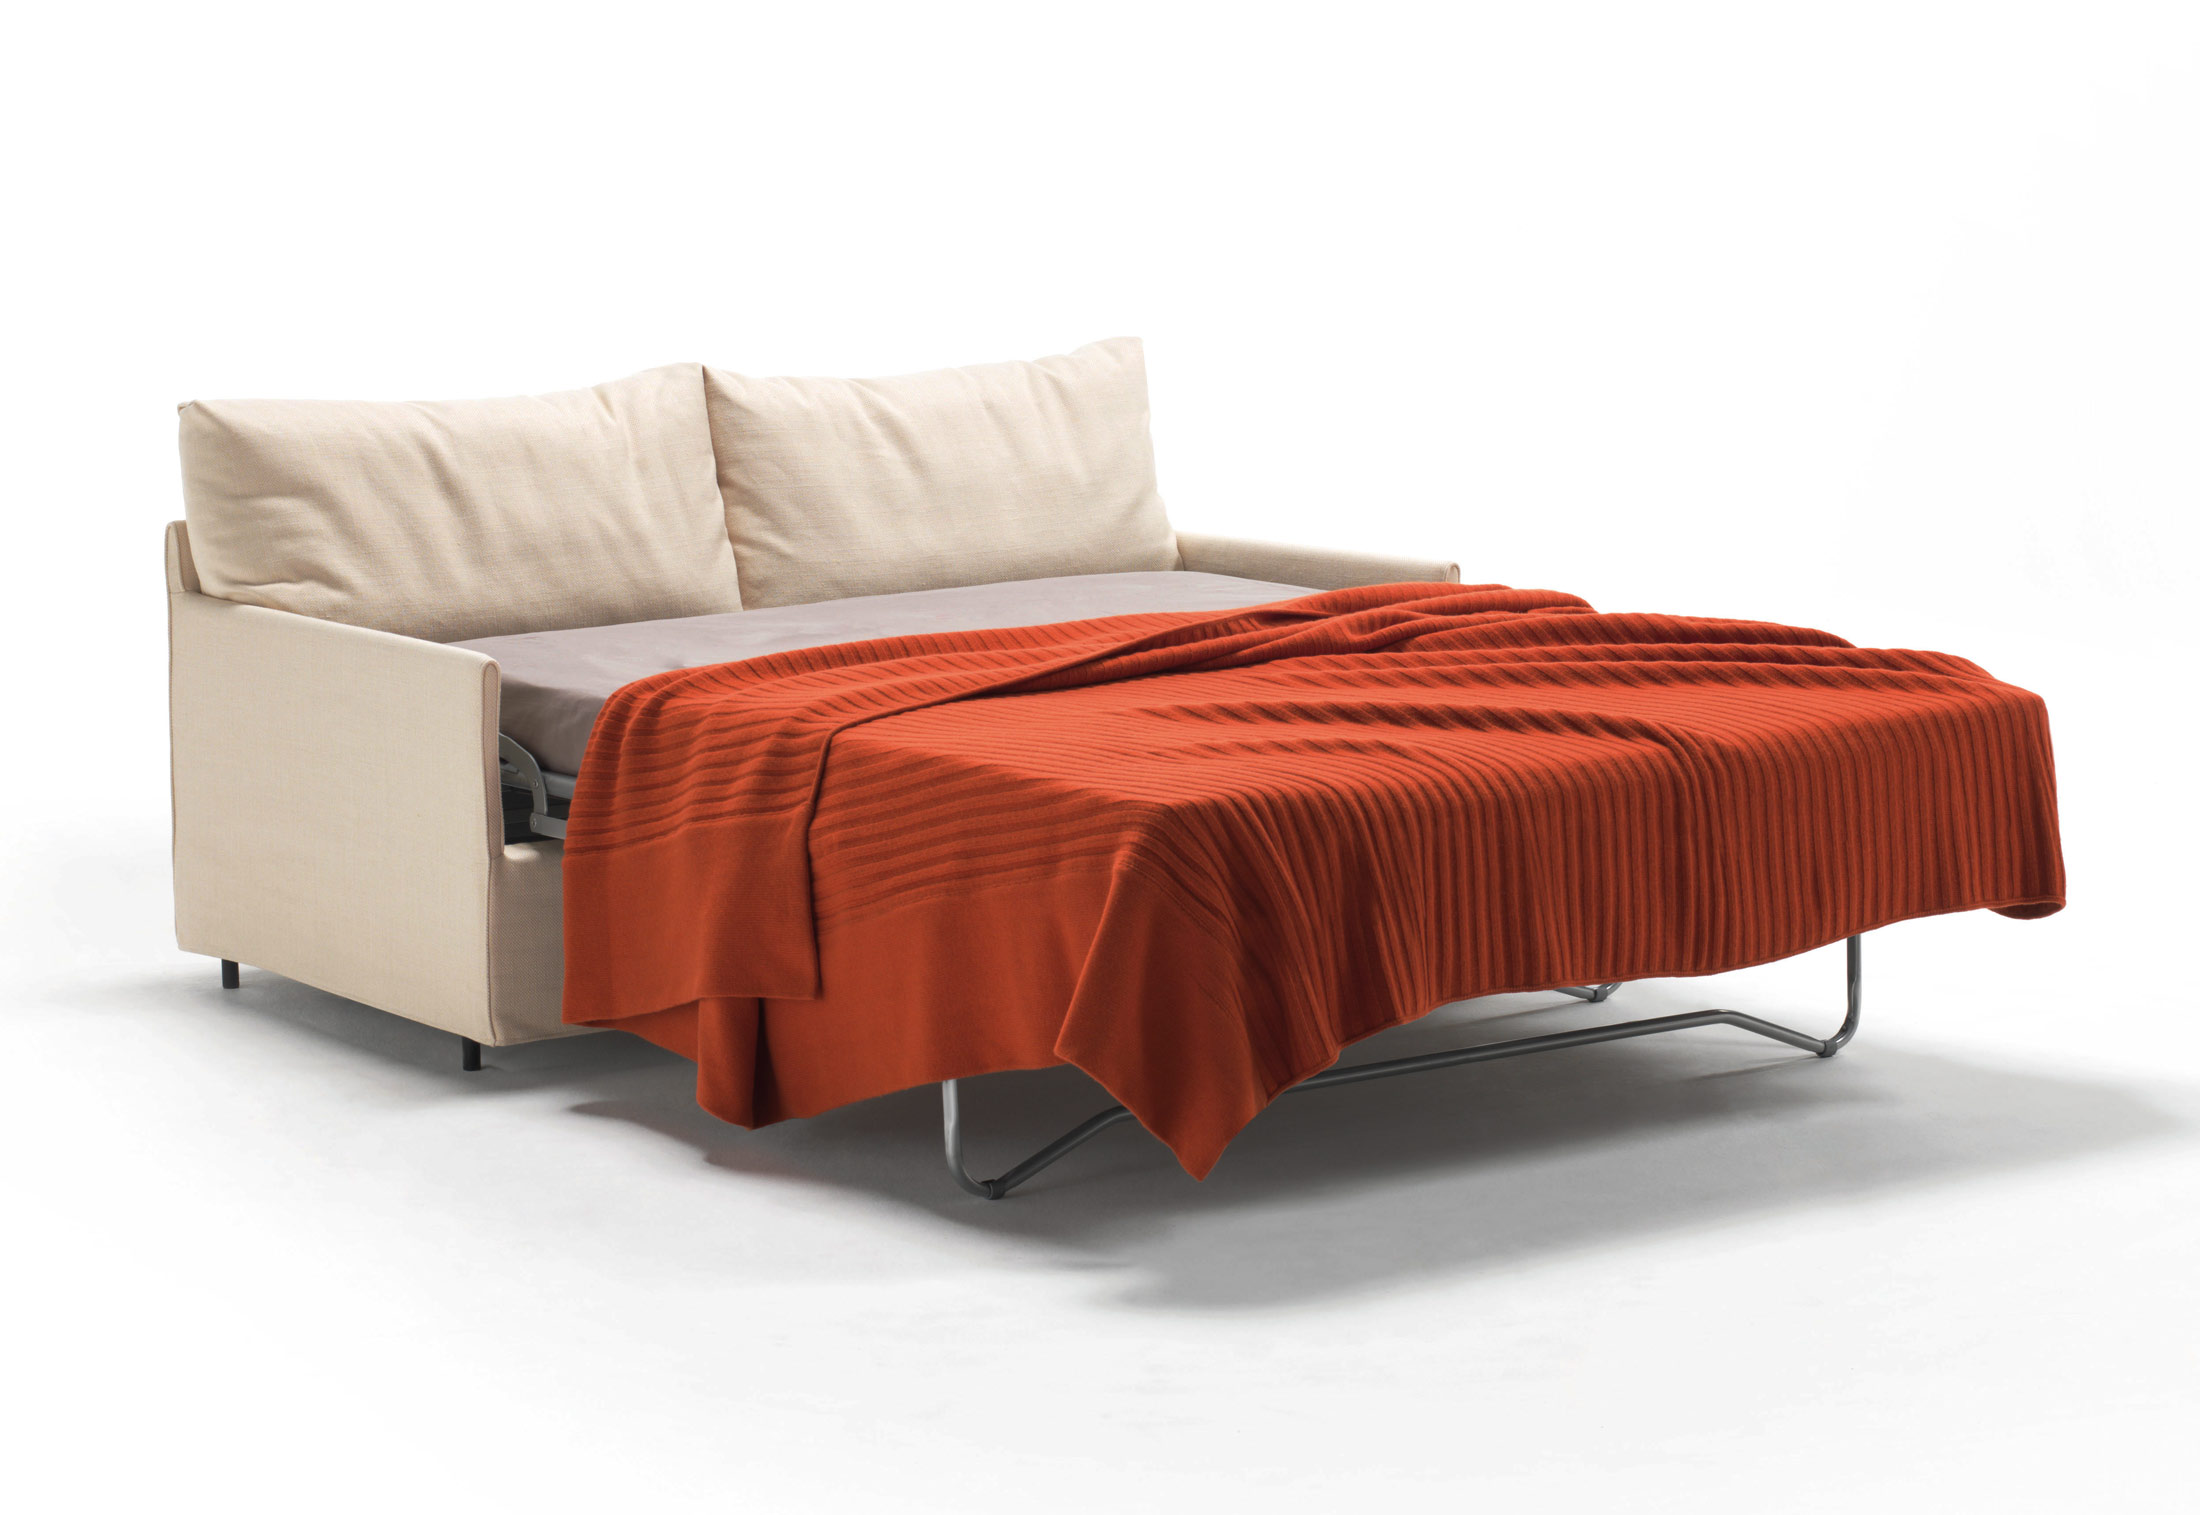 chemise sofa bed by living divani stylepark. Black Bedroom Furniture Sets. Home Design Ideas